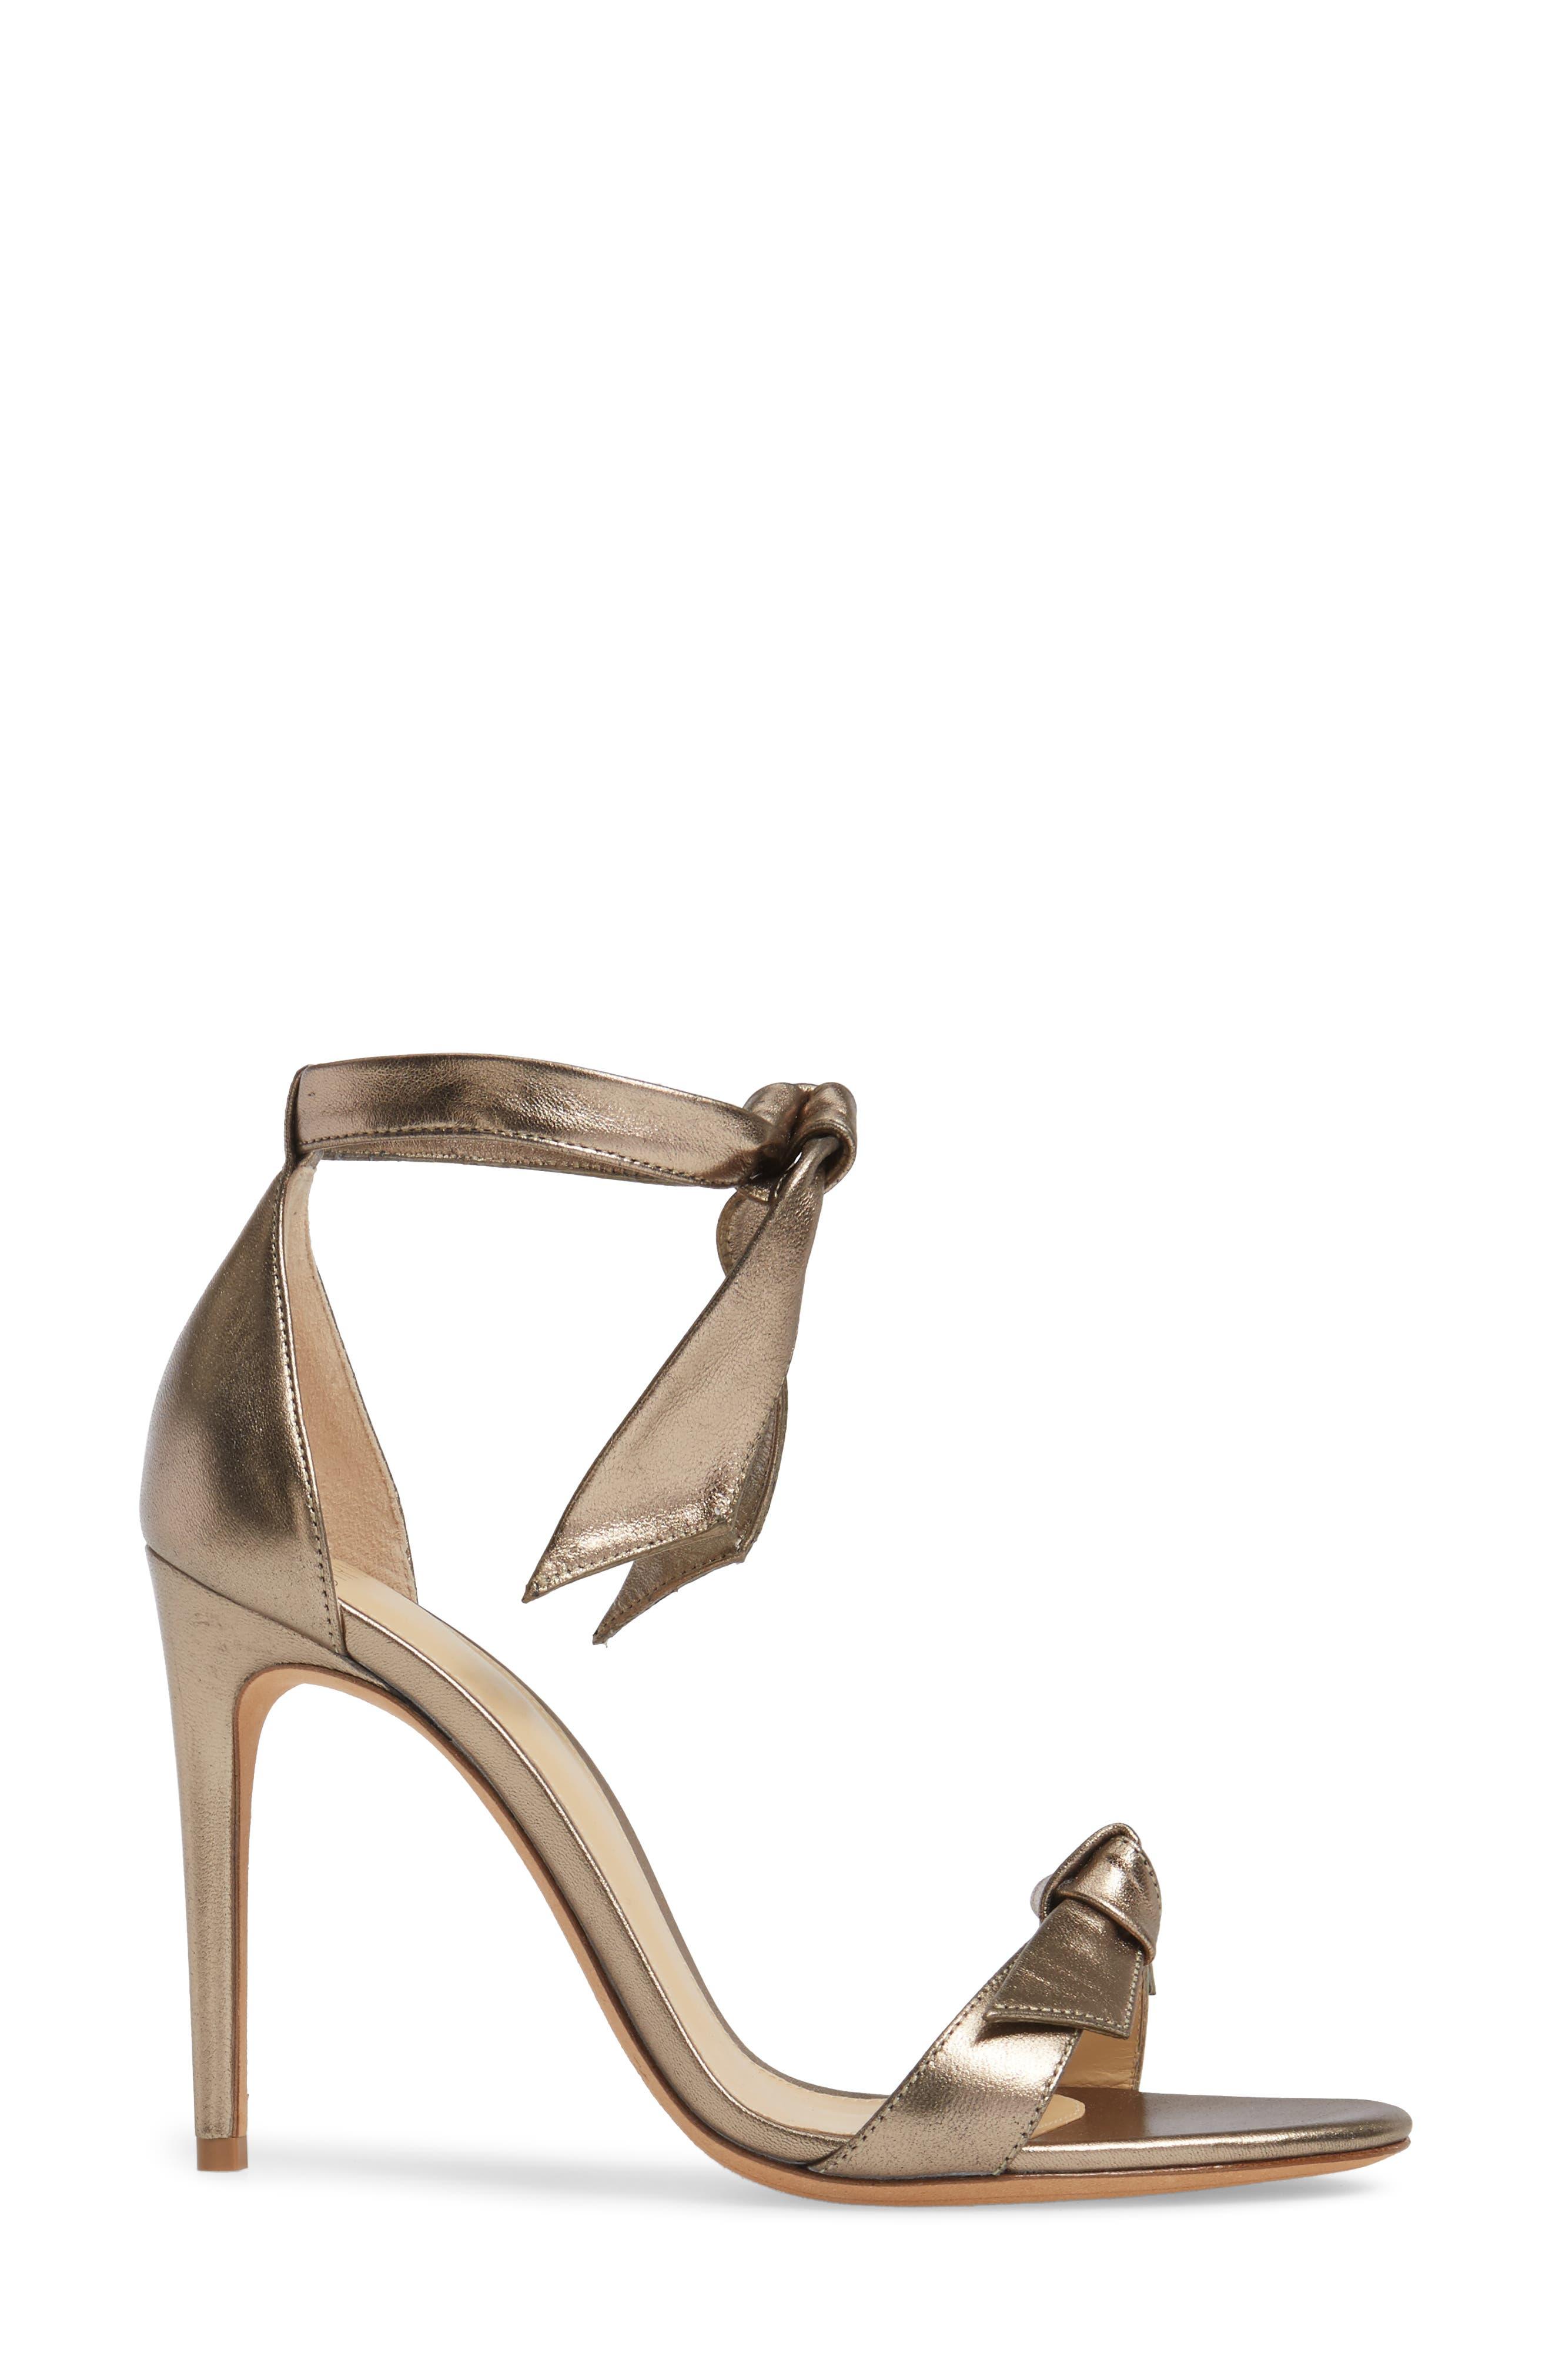 Clarita Ankle Tie Sandal,                             Alternate thumbnail 3, color,                             METALLIC GOLD LEATHER